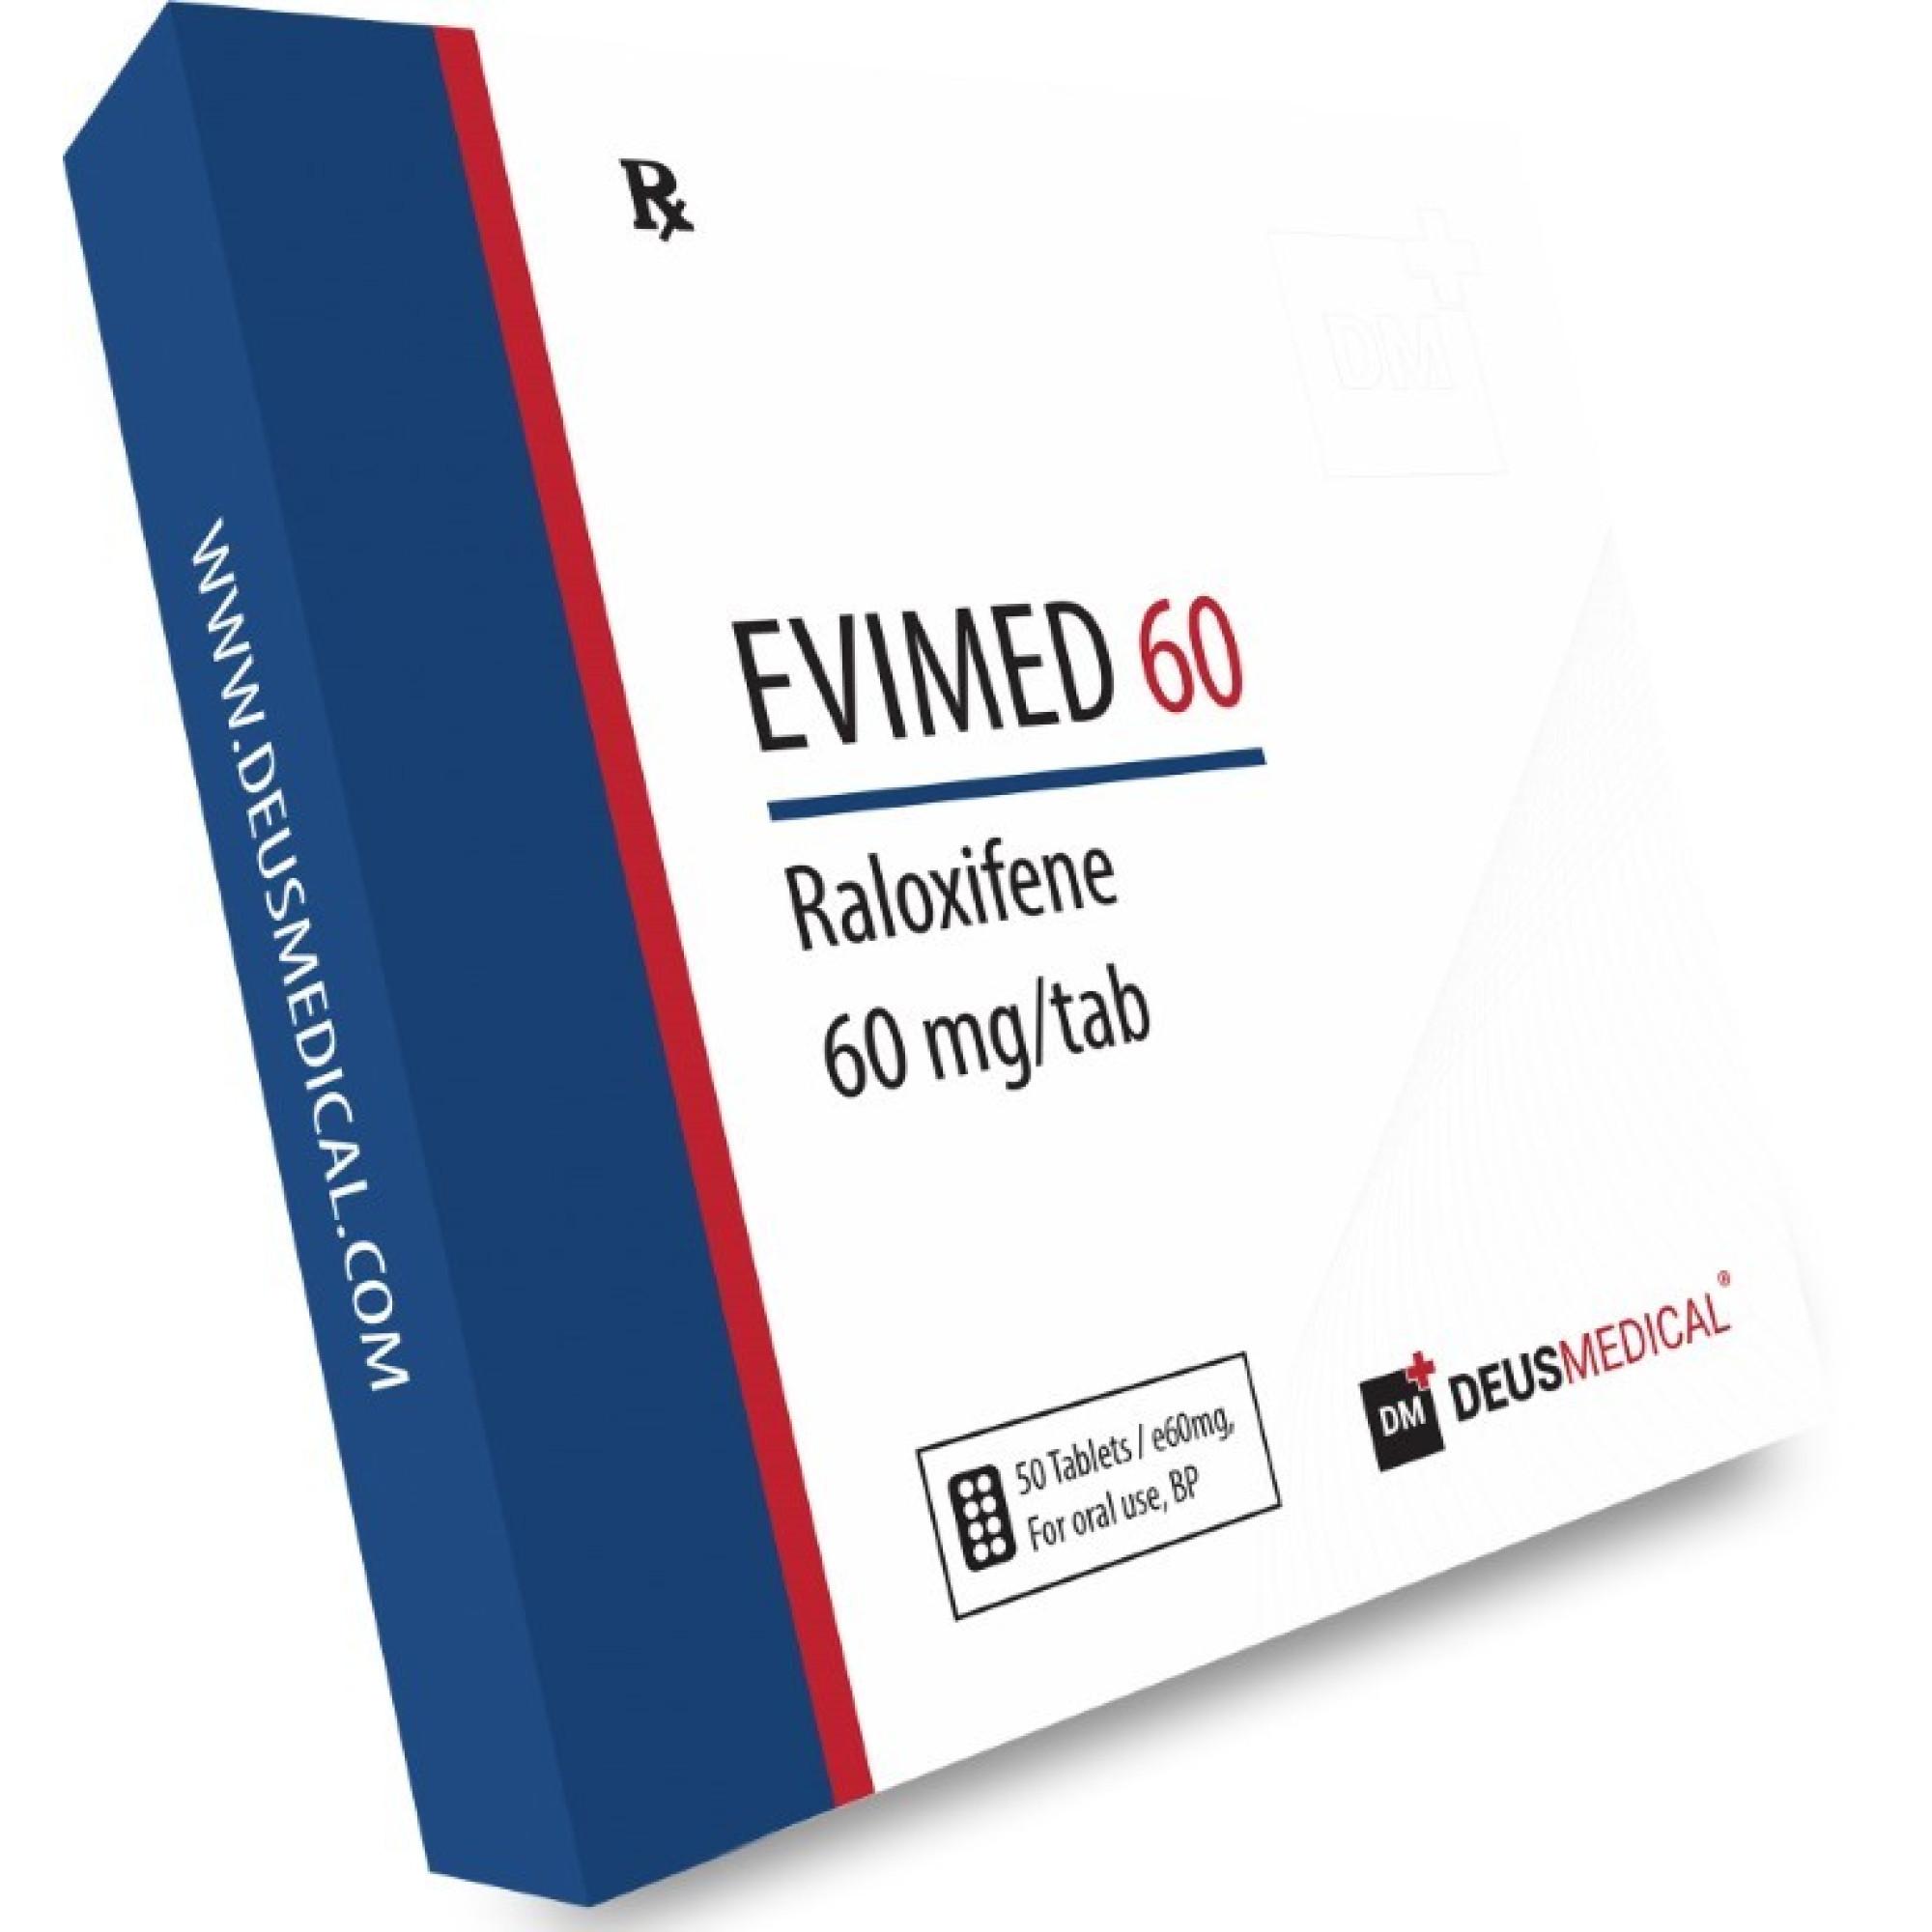 EVIMED 60 (Raloxifene HCL)